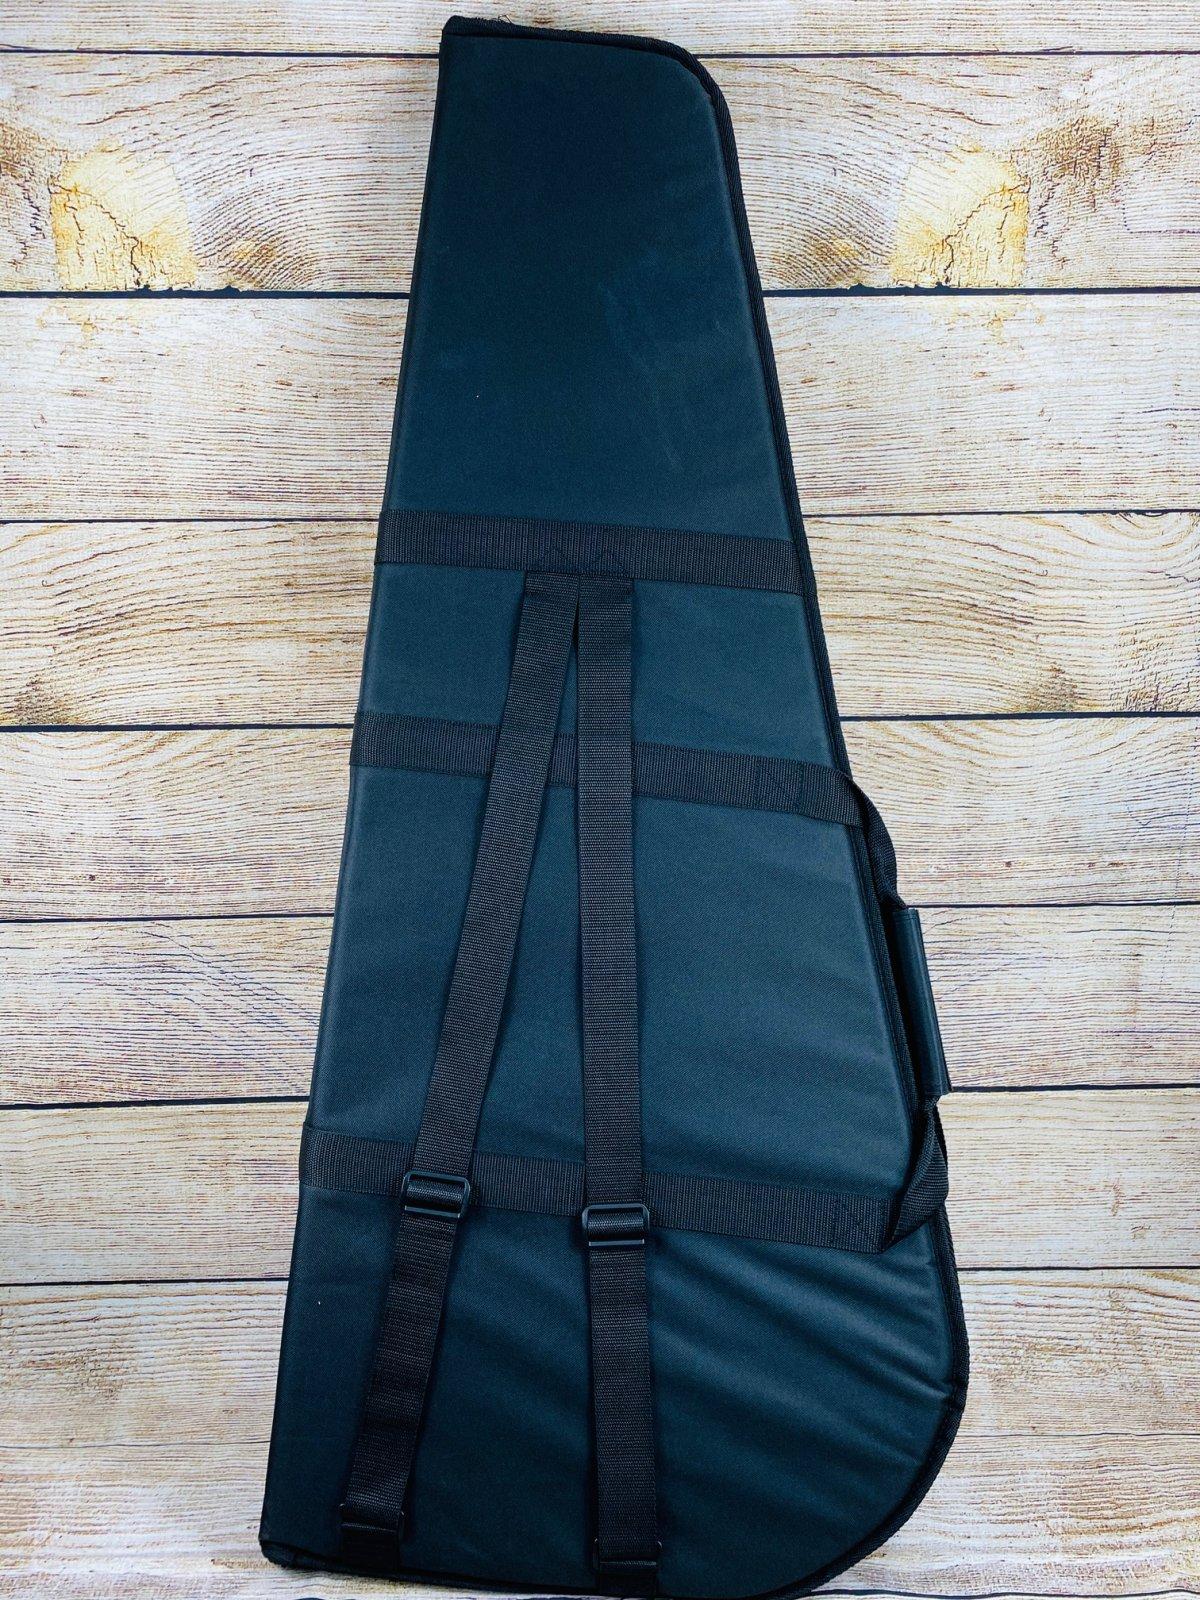 Epiphone Premium Solidbody Electric Guitar Gig Bag